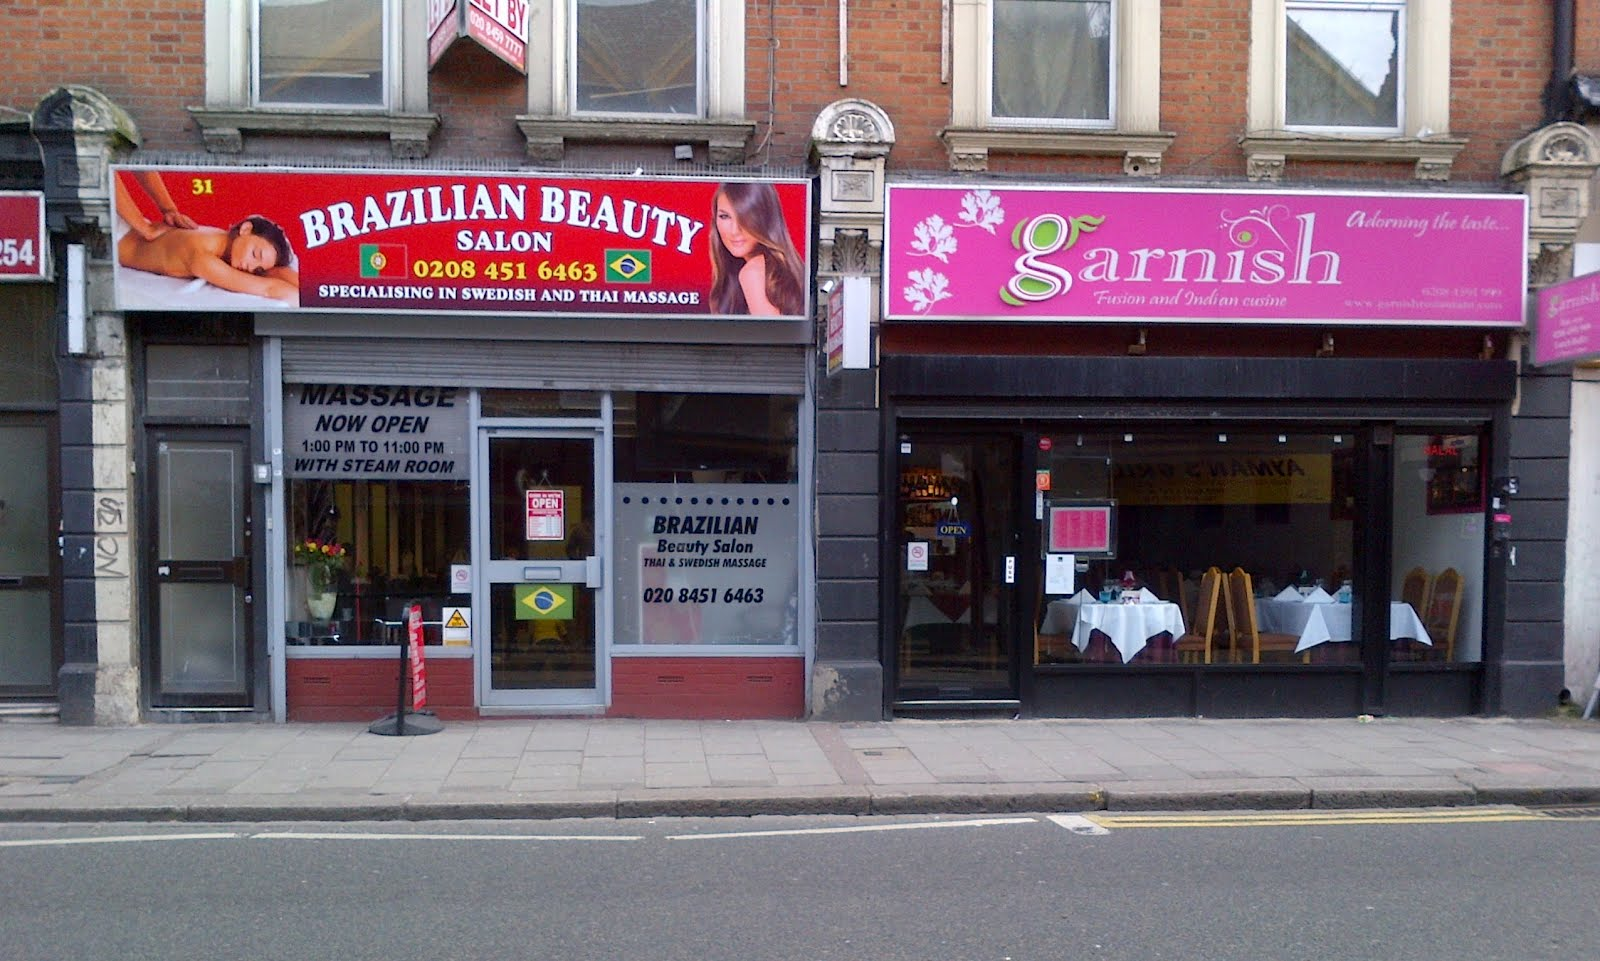 The Willesden Herald: Brazilian beauty salon & Garnish restaurant